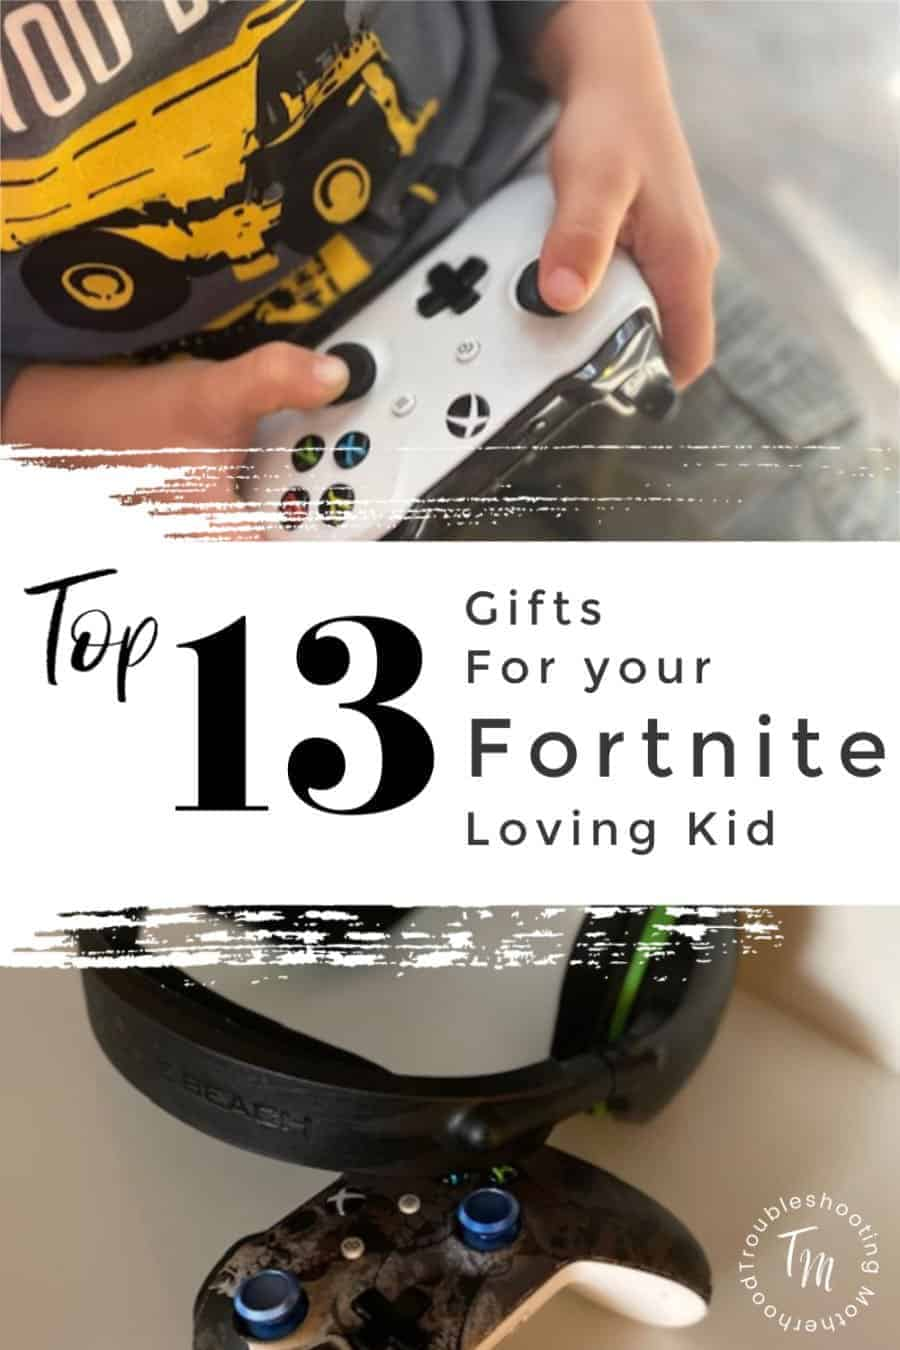 V Bucks Fortnite Printout Gifts Best Gifts For Fortnite Players Troubleshooting Motherhood